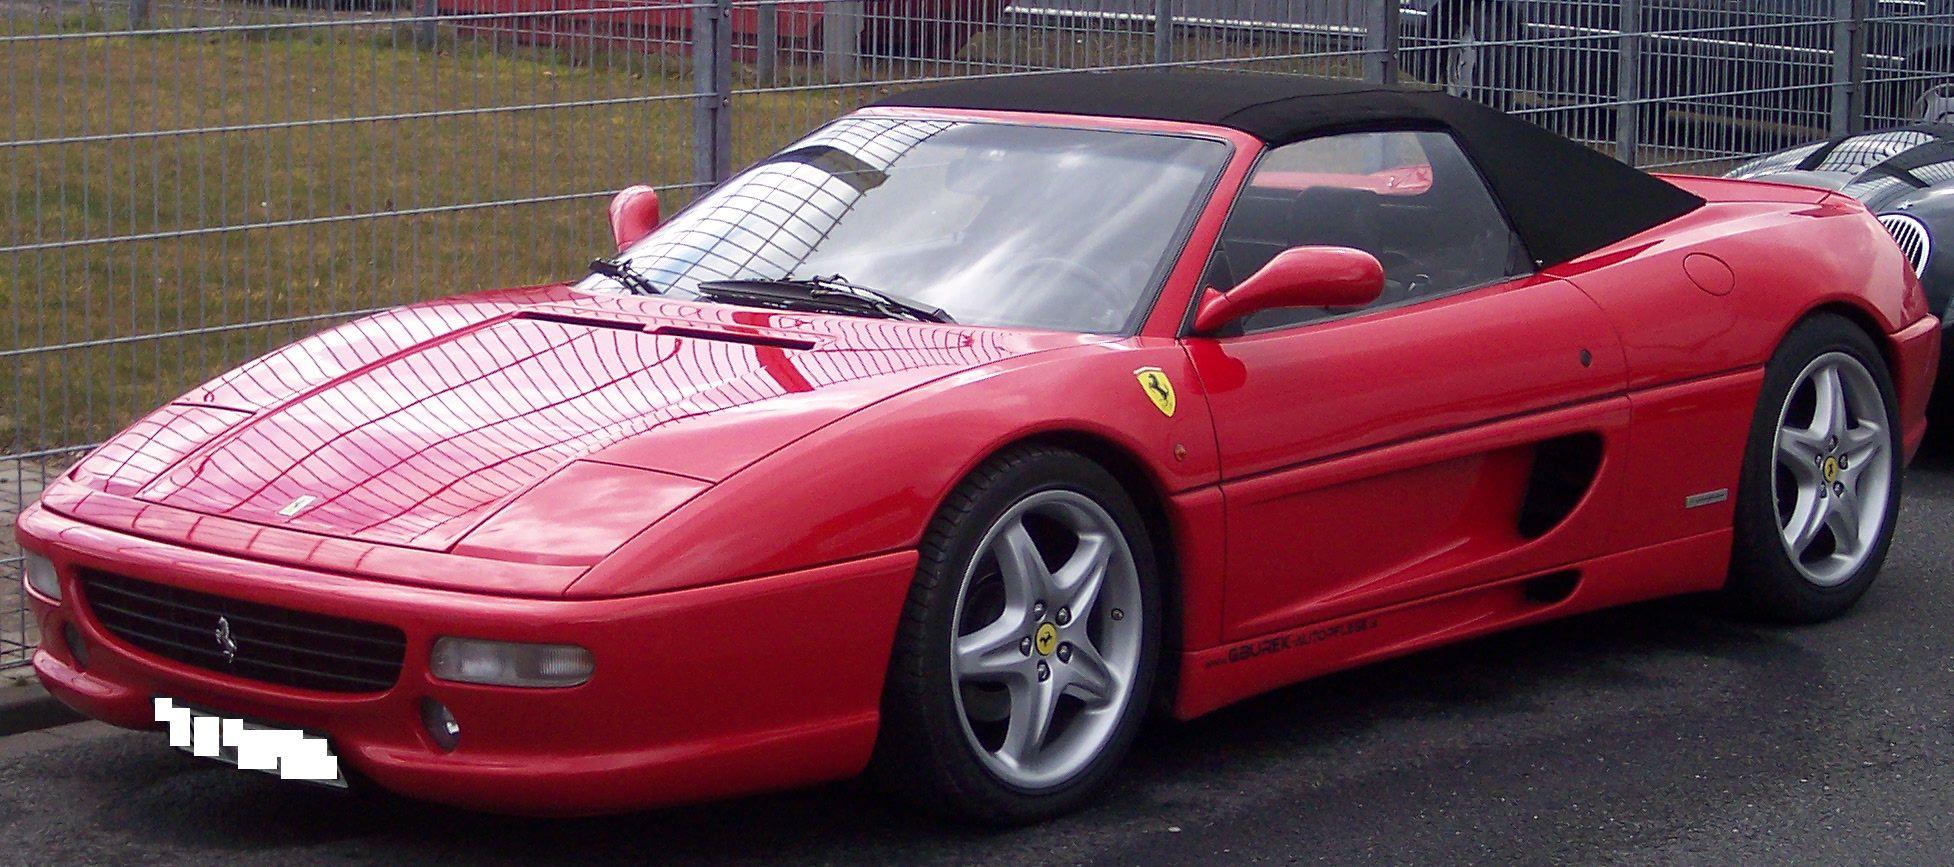 TopWorldAuto >> Photos of Ferrari F355 Spider - photo galleries on ariel atom blueprints, porsche gt3 blueprints, ac cobra blueprints, hummer blueprints, gmc blueprints, nissan blueprints, honda blueprints, porsche suv blueprints, chrysler blueprints, mazda blueprints,